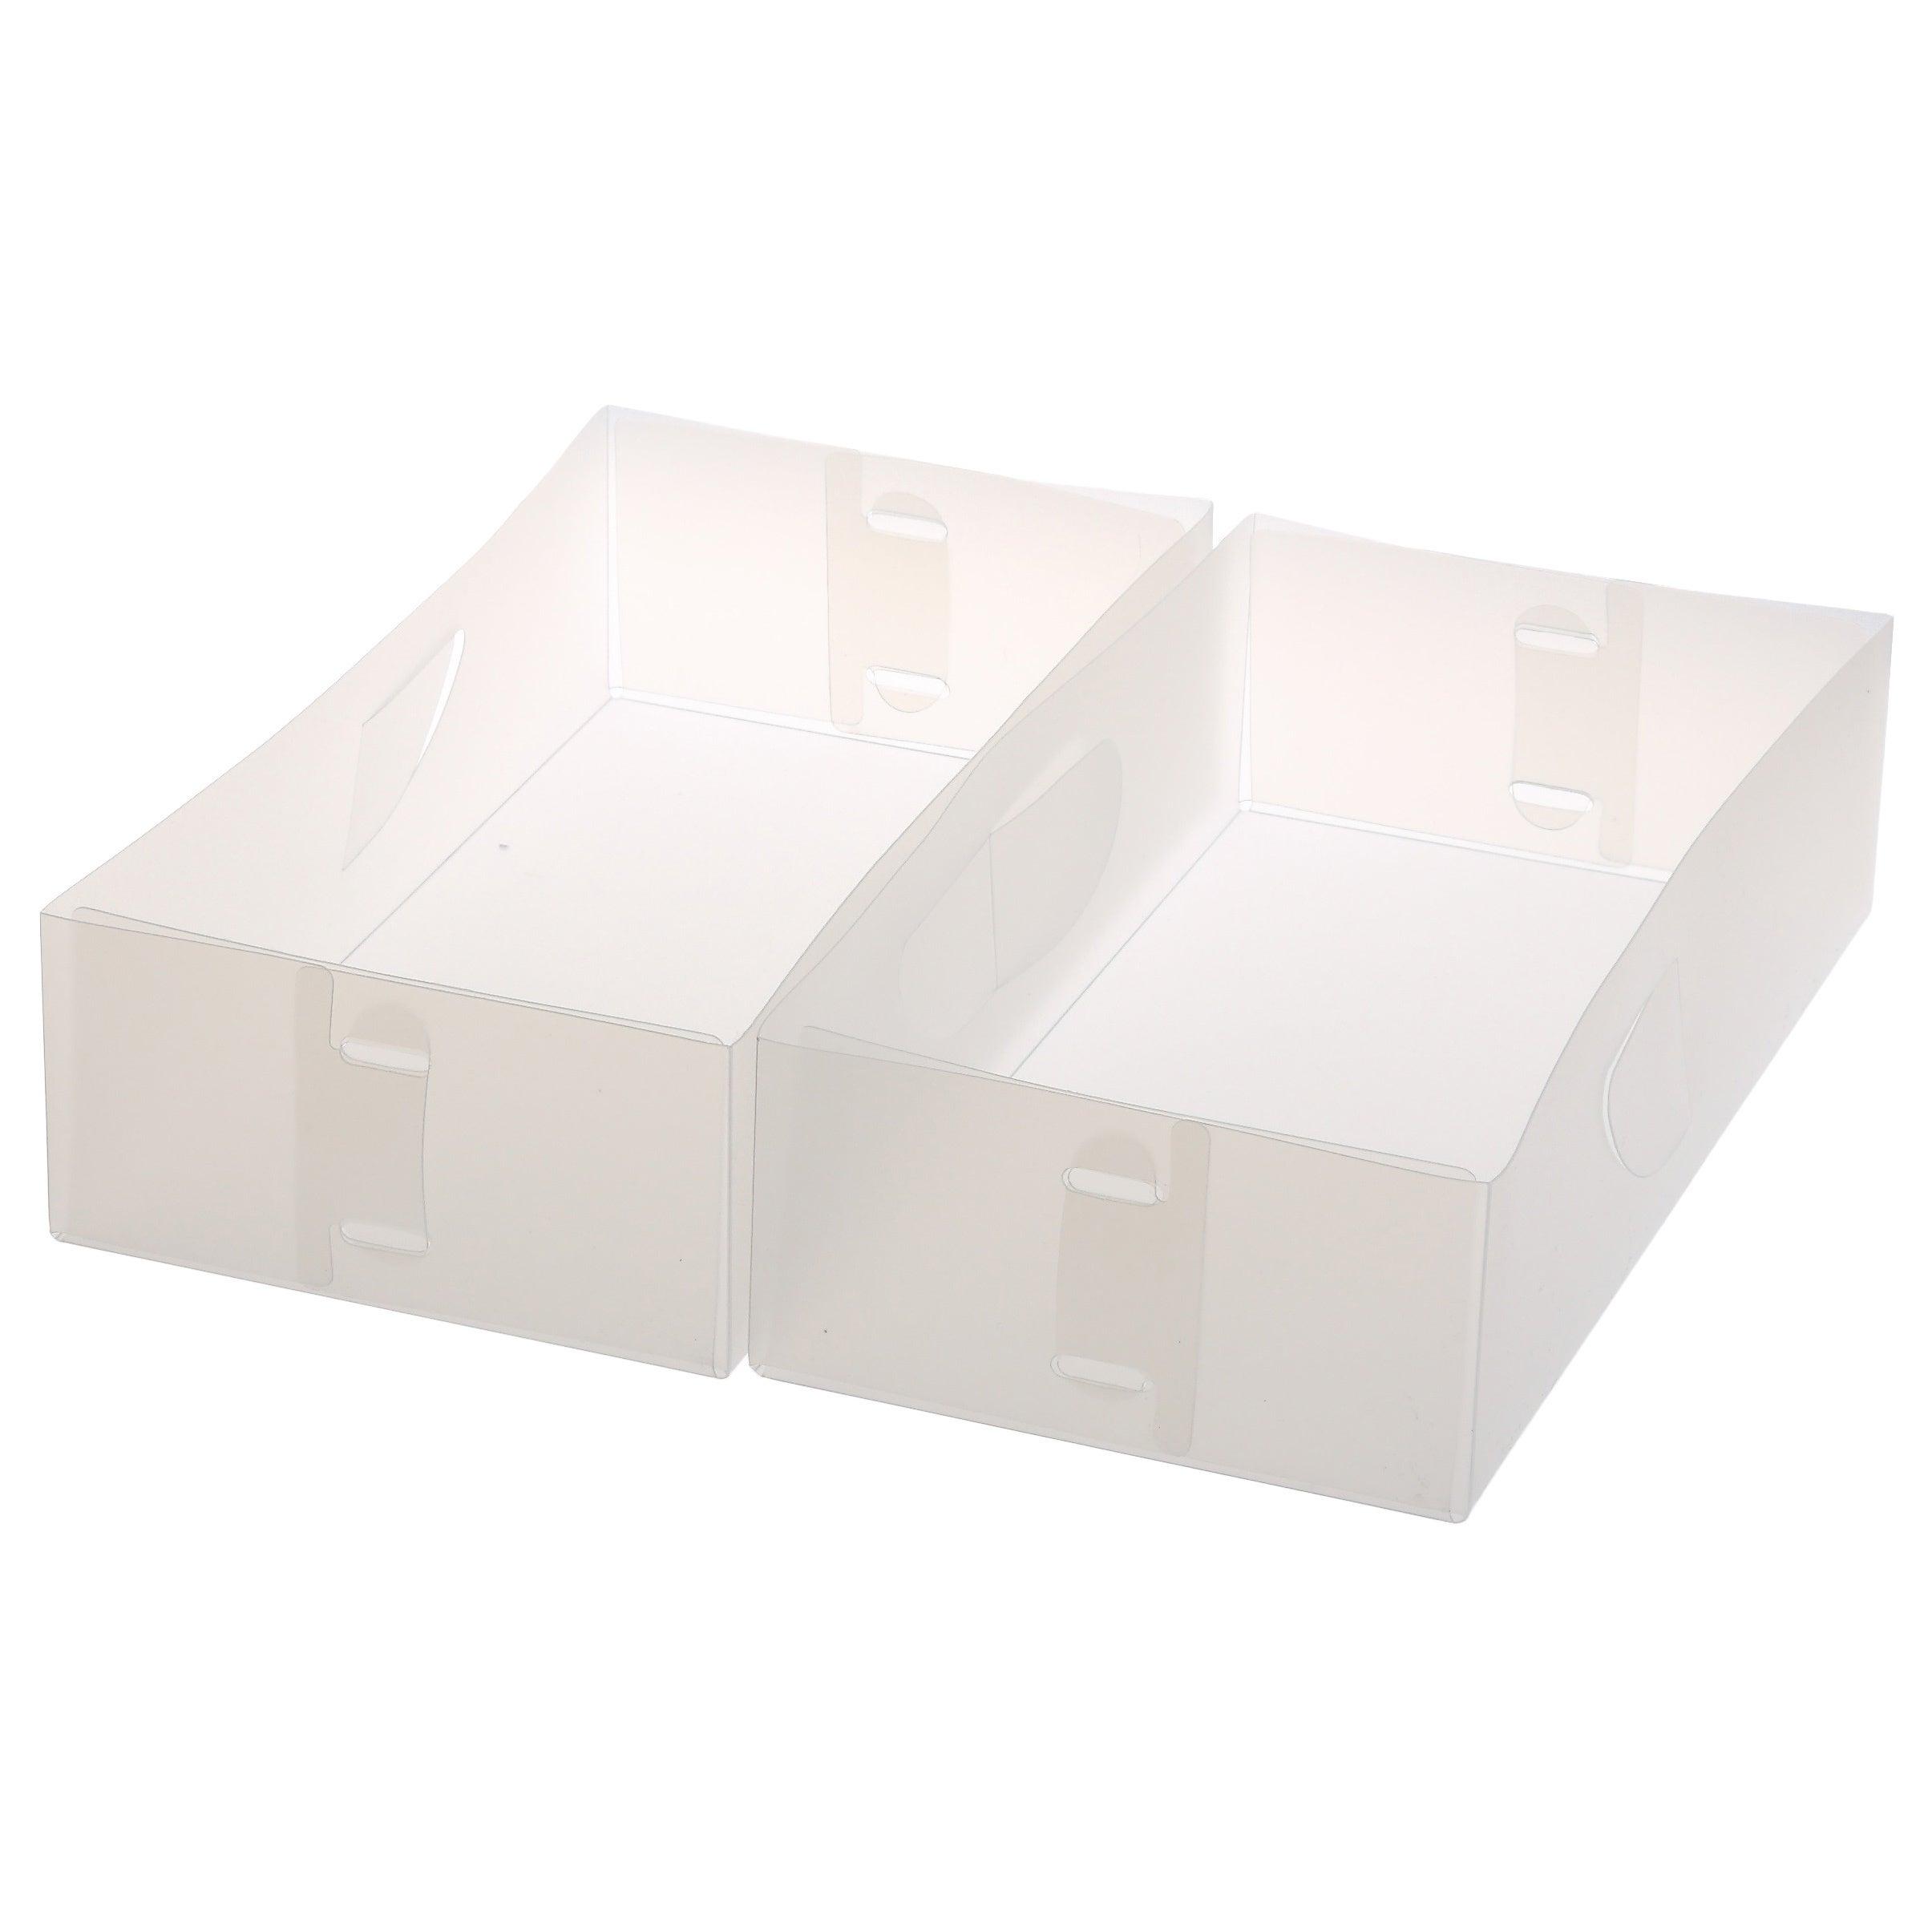 Ybm Home Closet/Dresser Drawer Divider Storage Foldable, ...